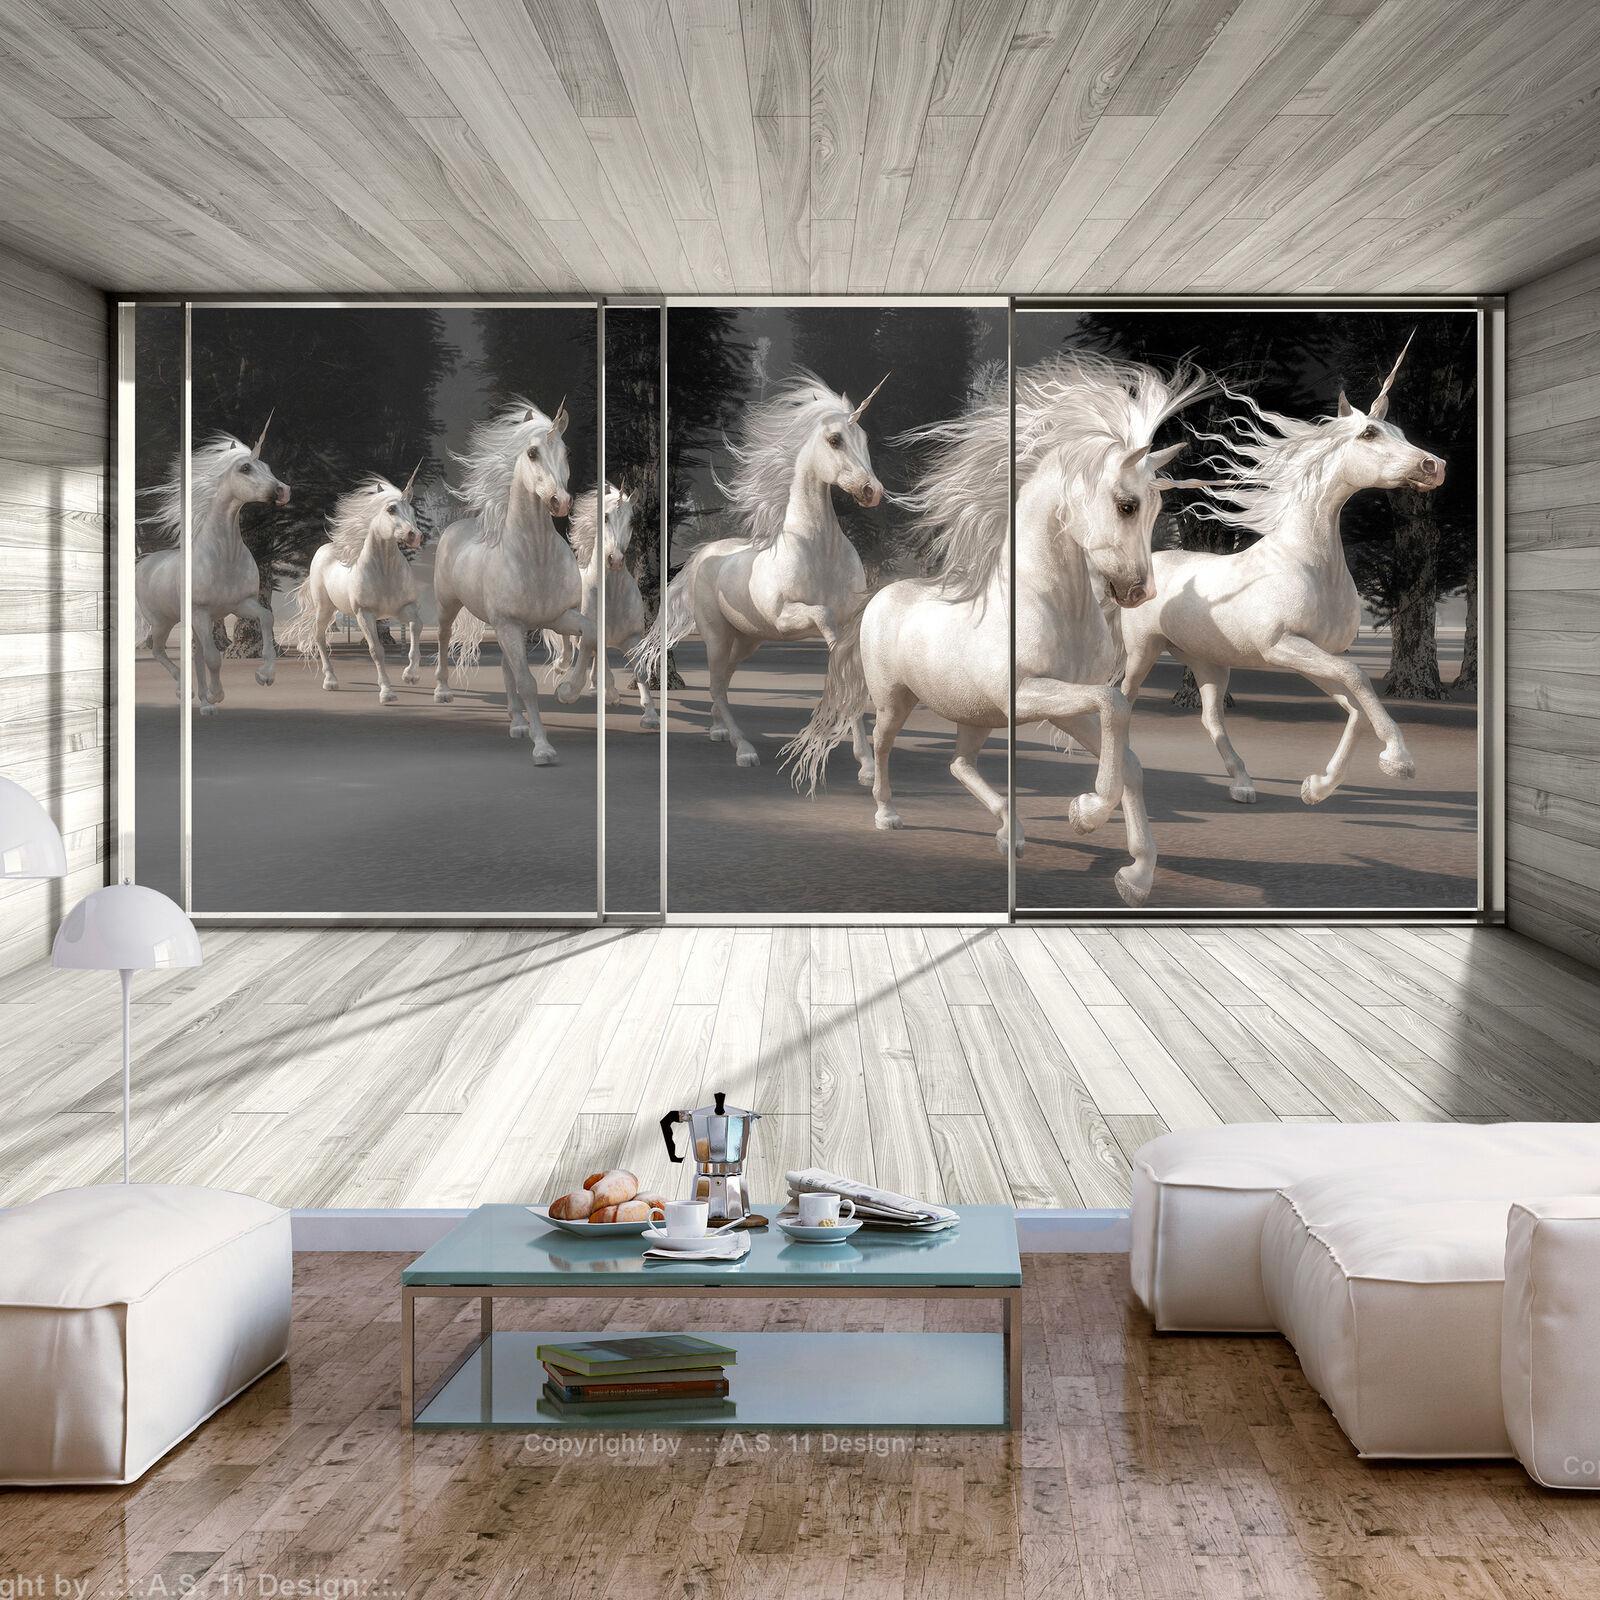 VLIES FOTOTAPETE Pferde Einhorn Holzeffekt grau 3D effekt TAPETE WANDBILDER XXL